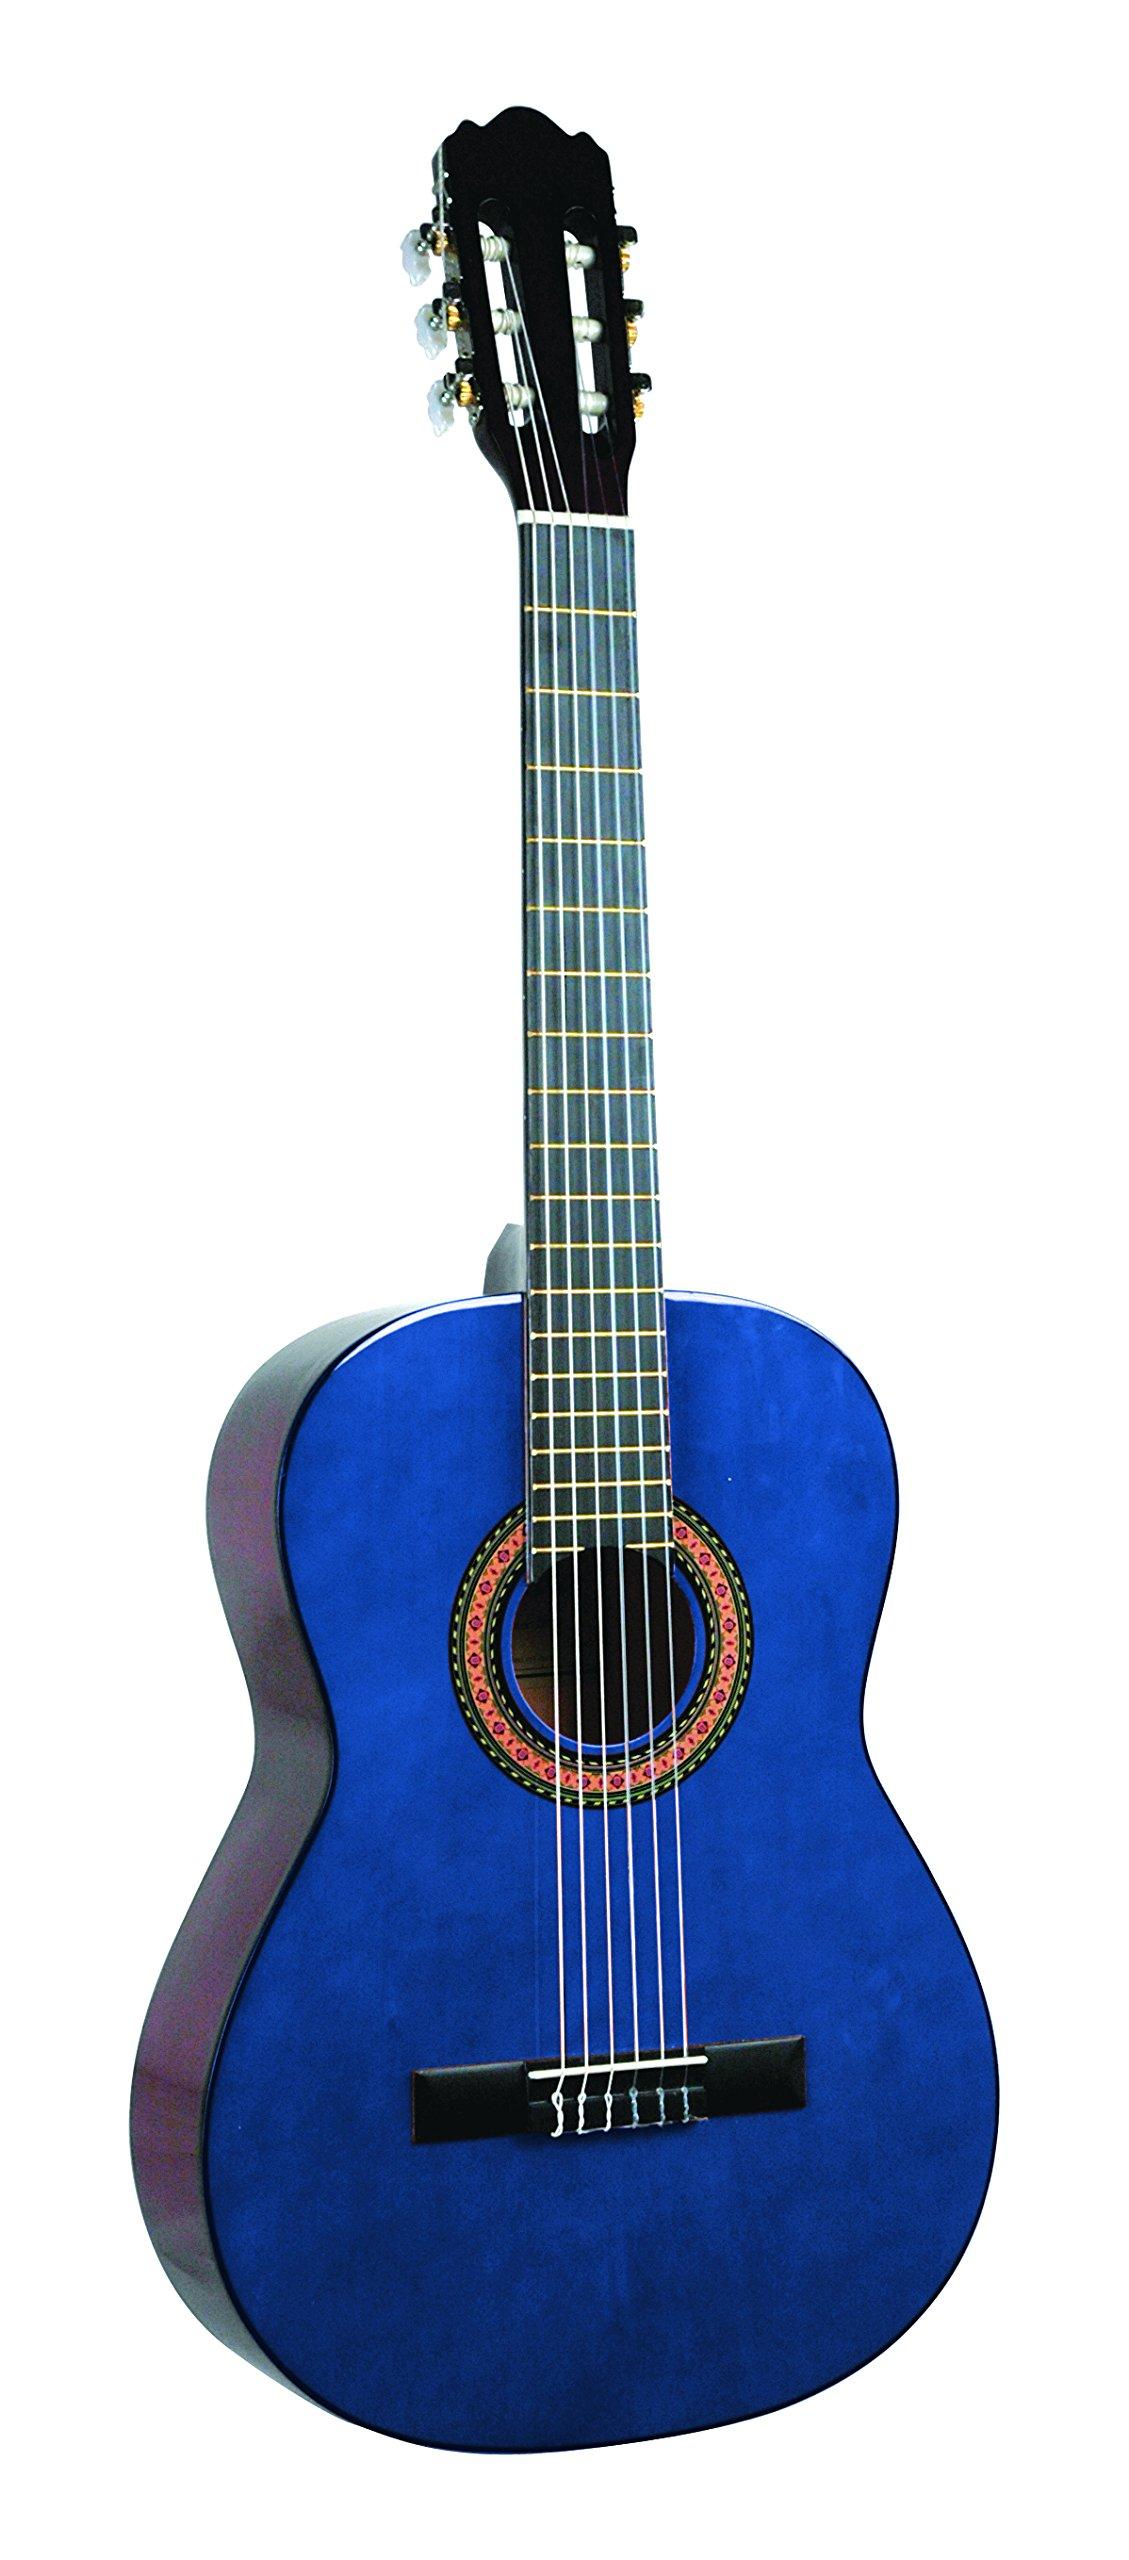 Lucida LG-400-BL Student Classical Guitar, Blue